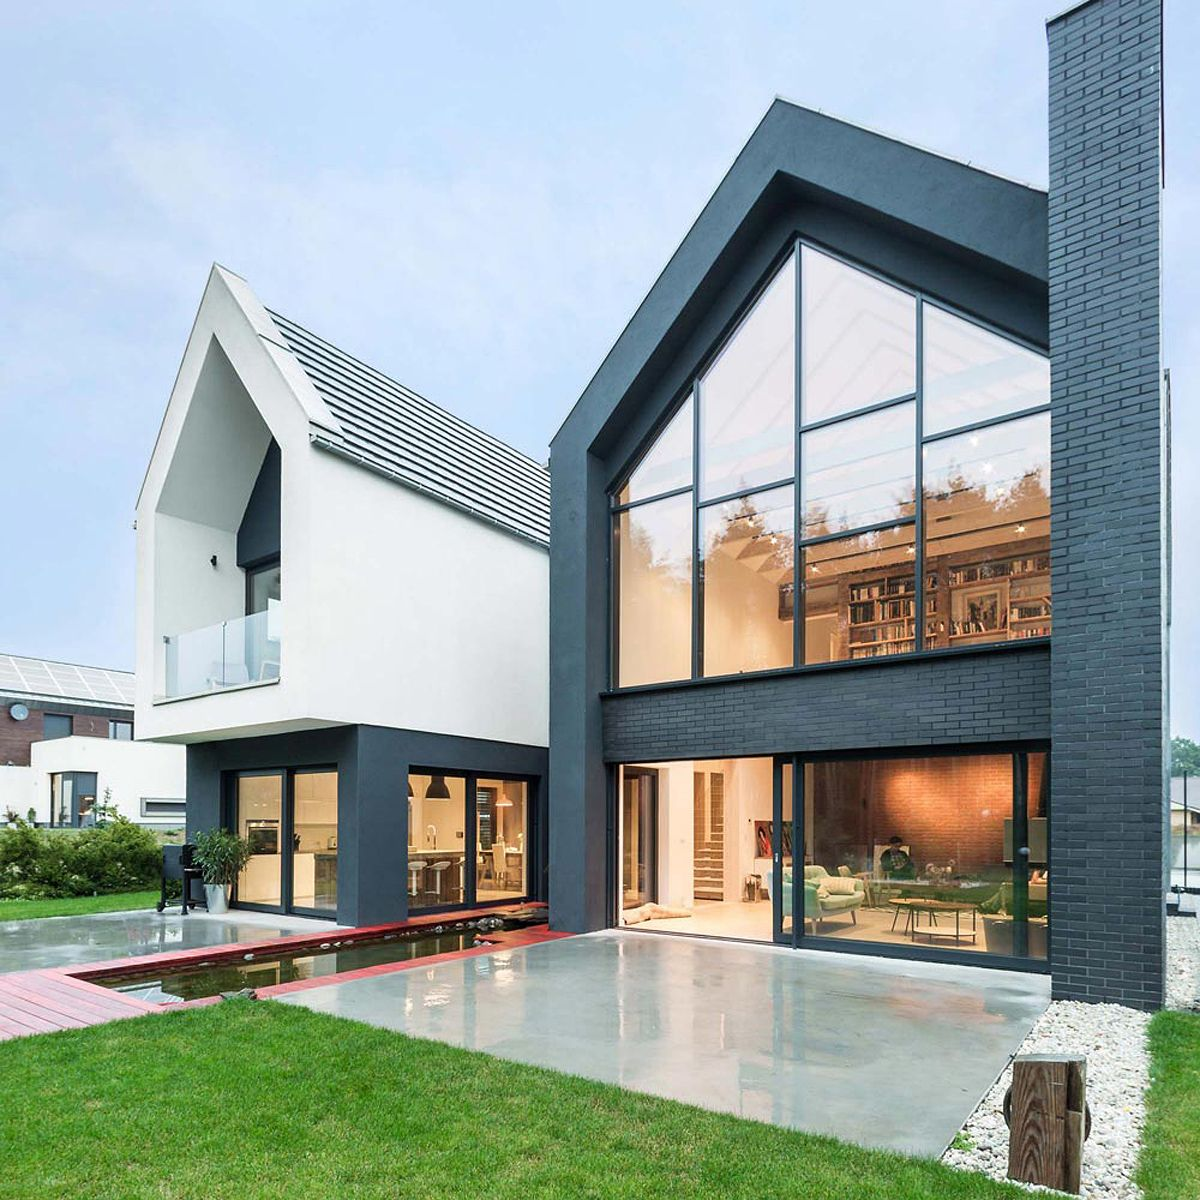 Fence House by mode:lina